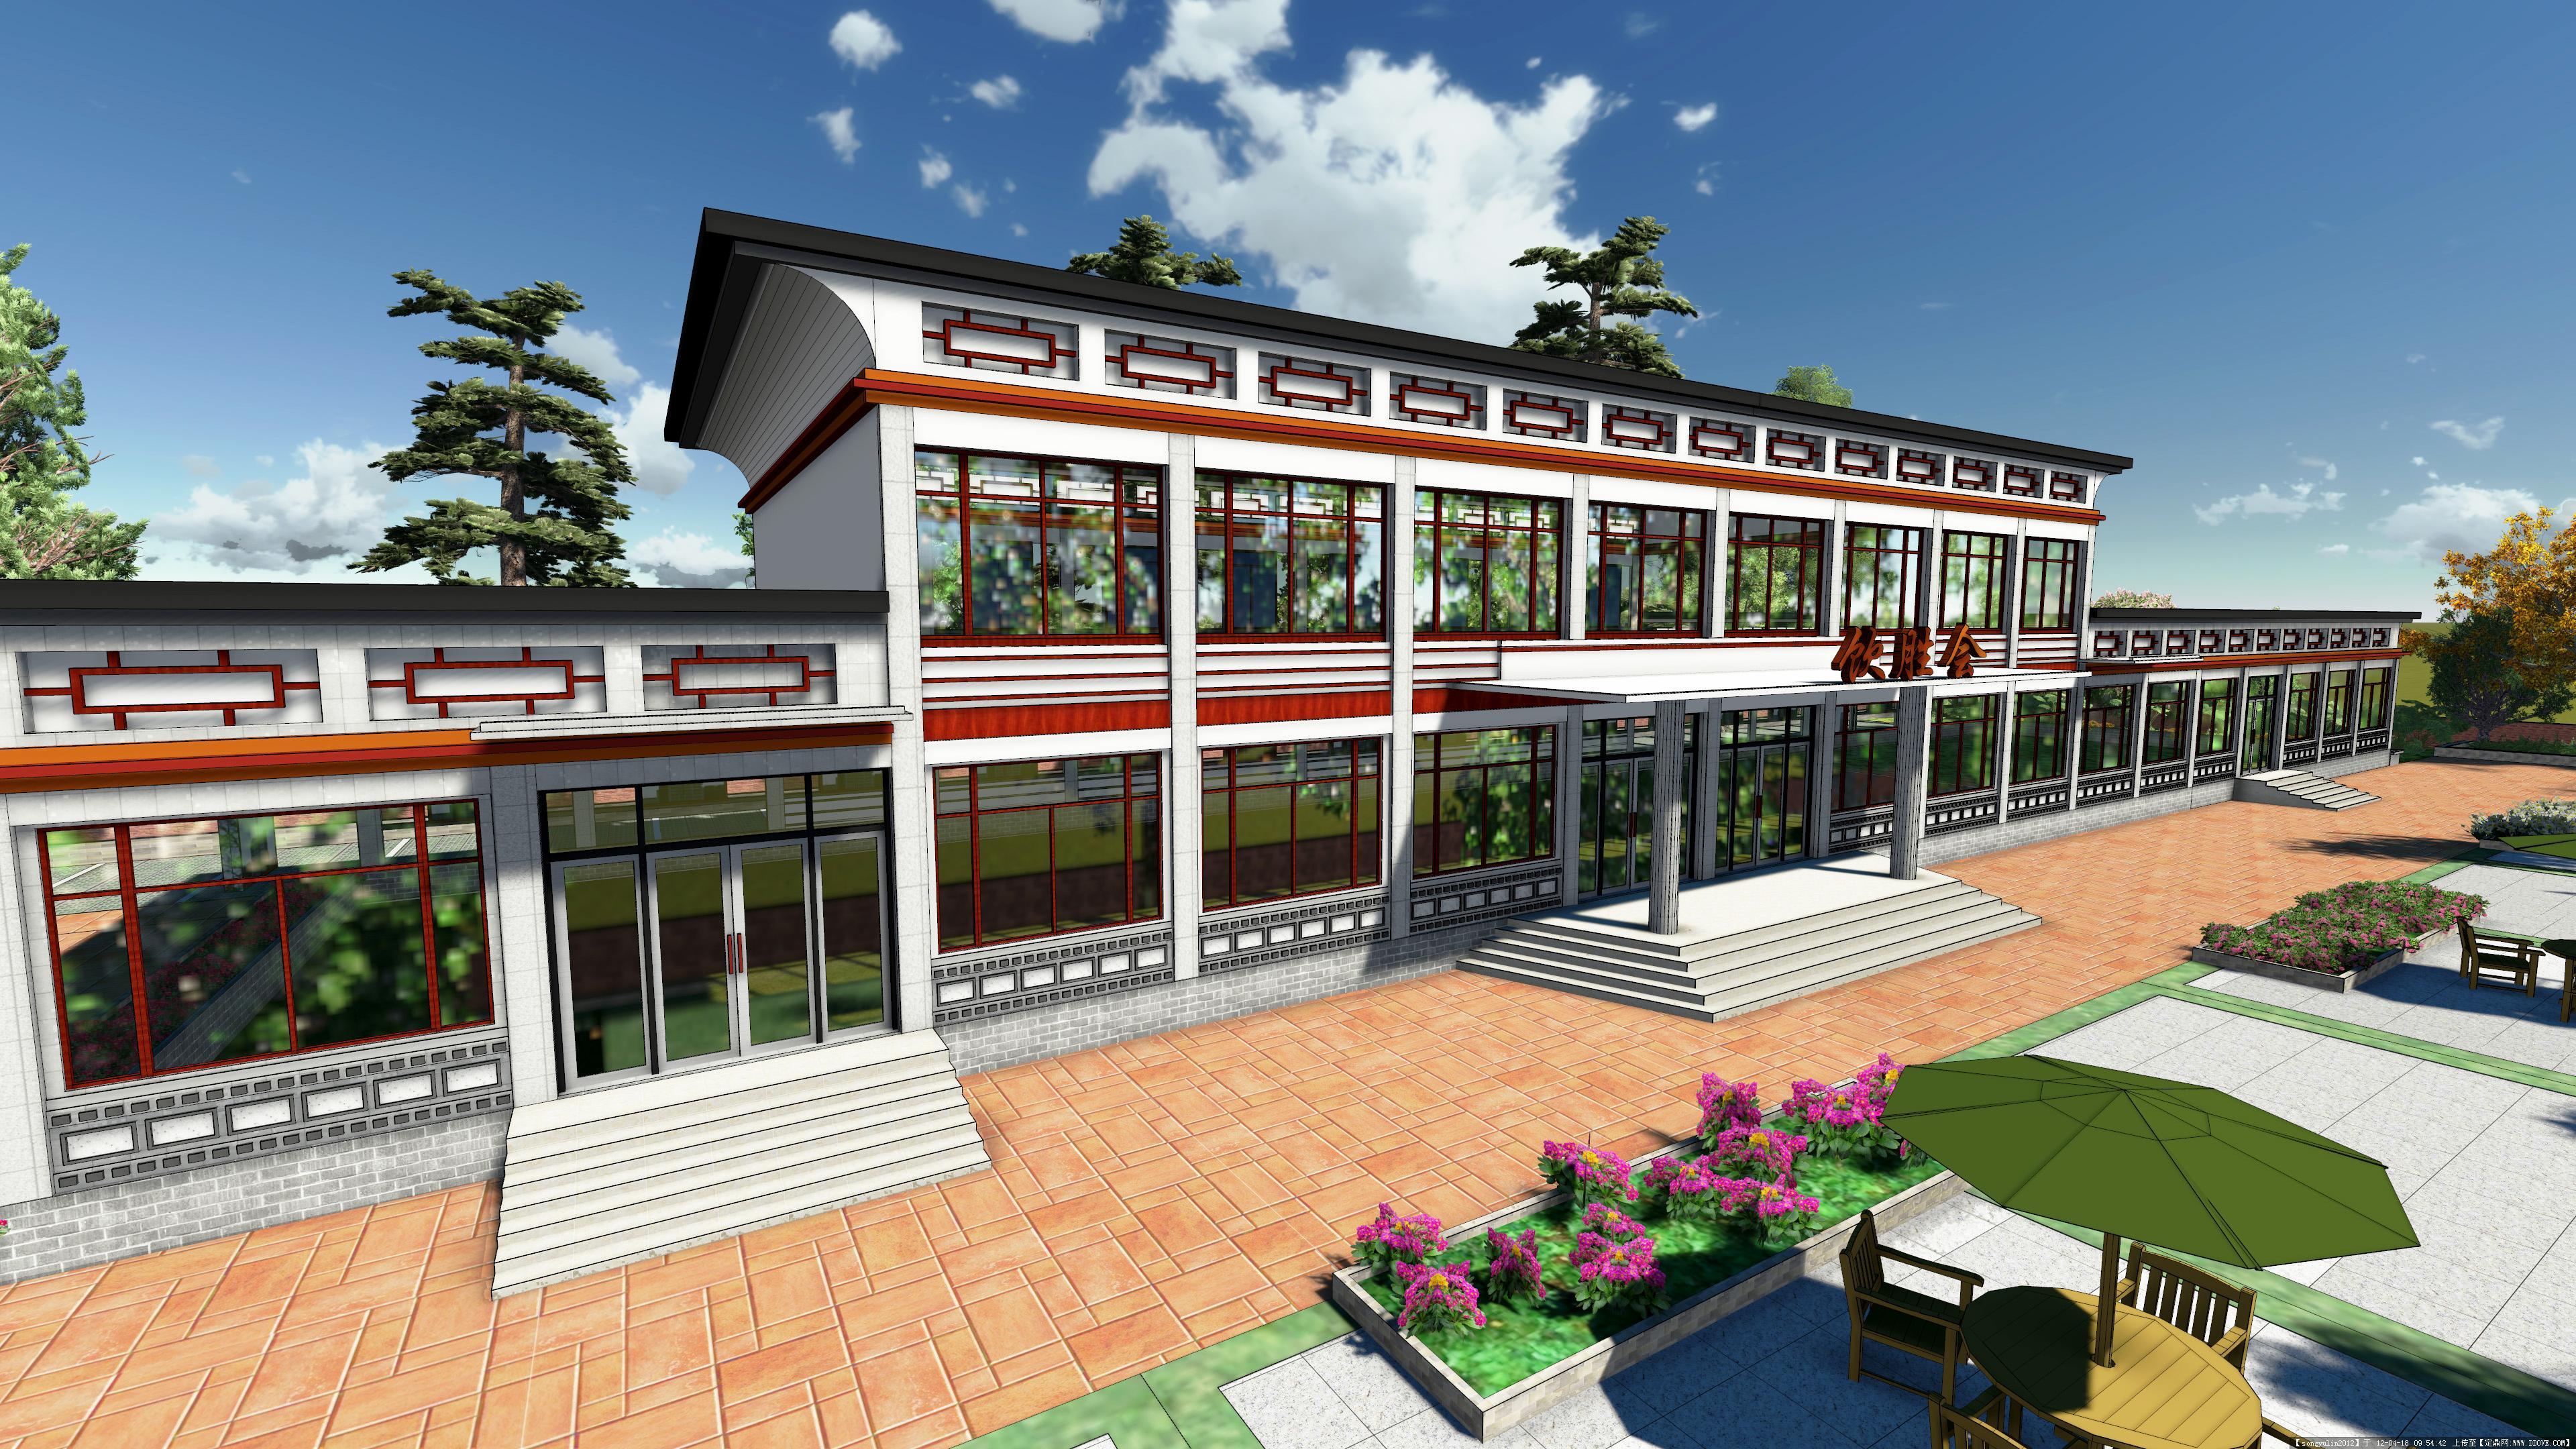 lumion做的中式园林餐厅建筑效果图图片